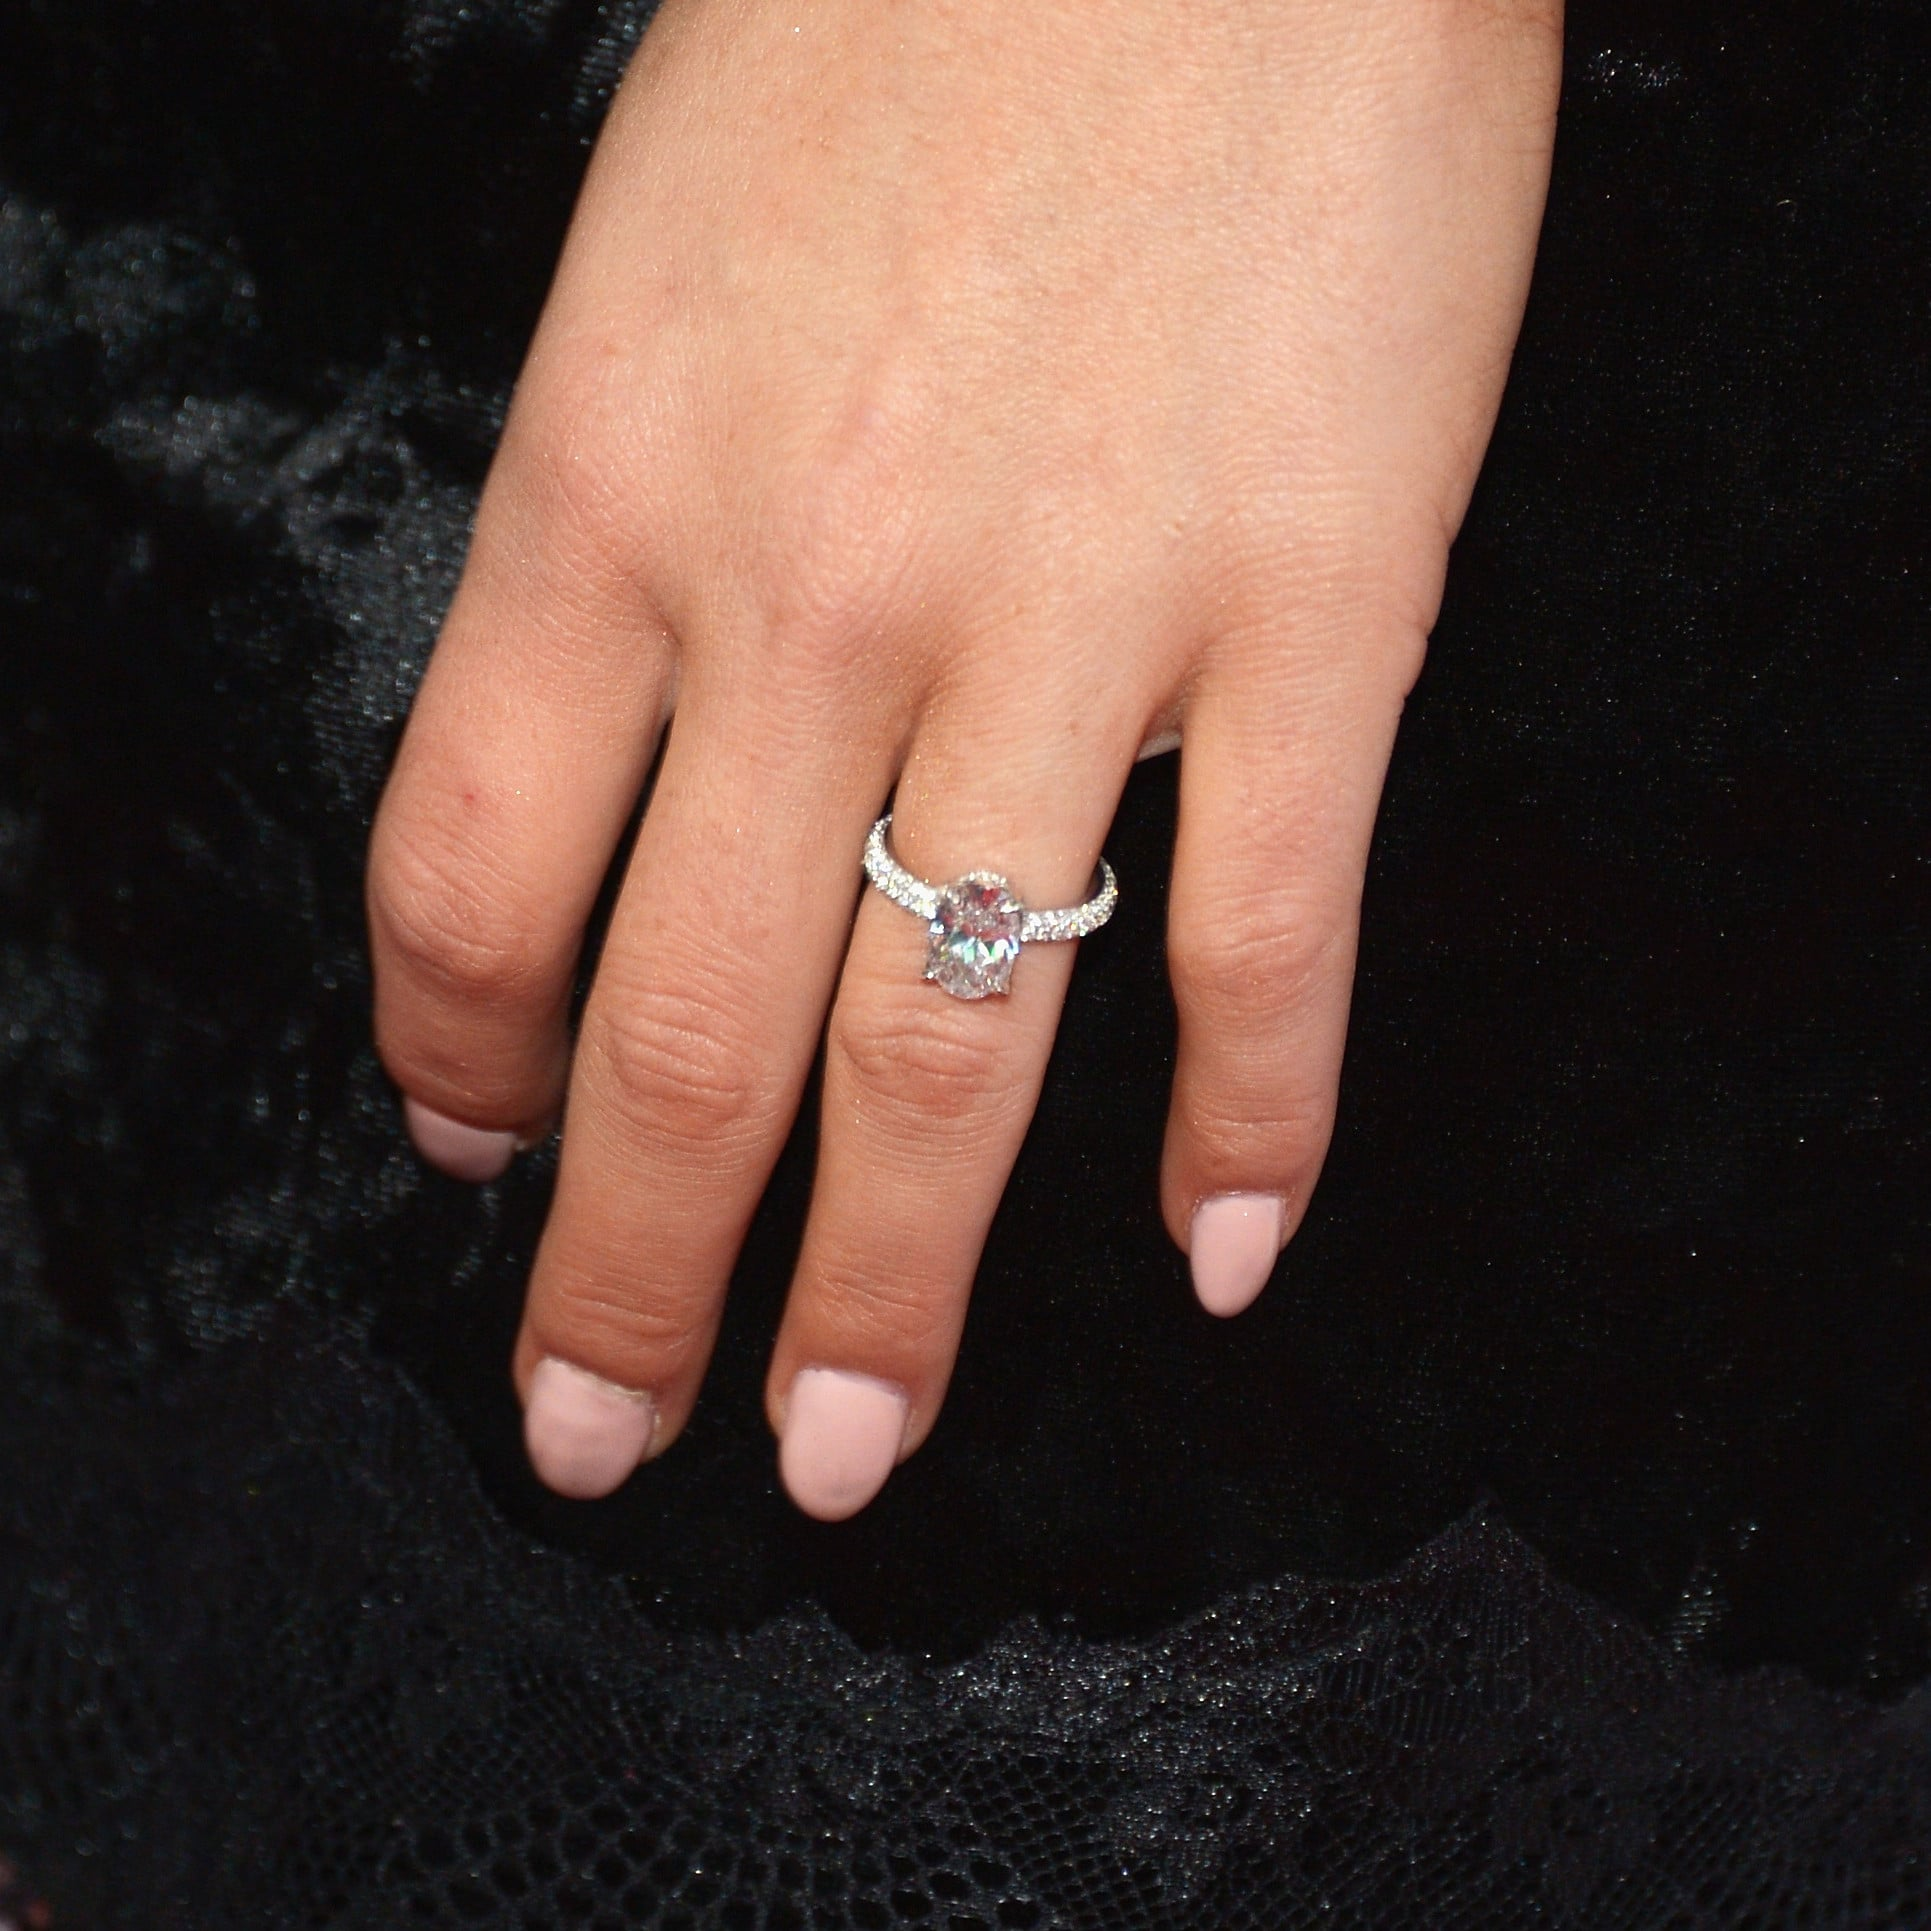 The Bachelorette Engagement Rings